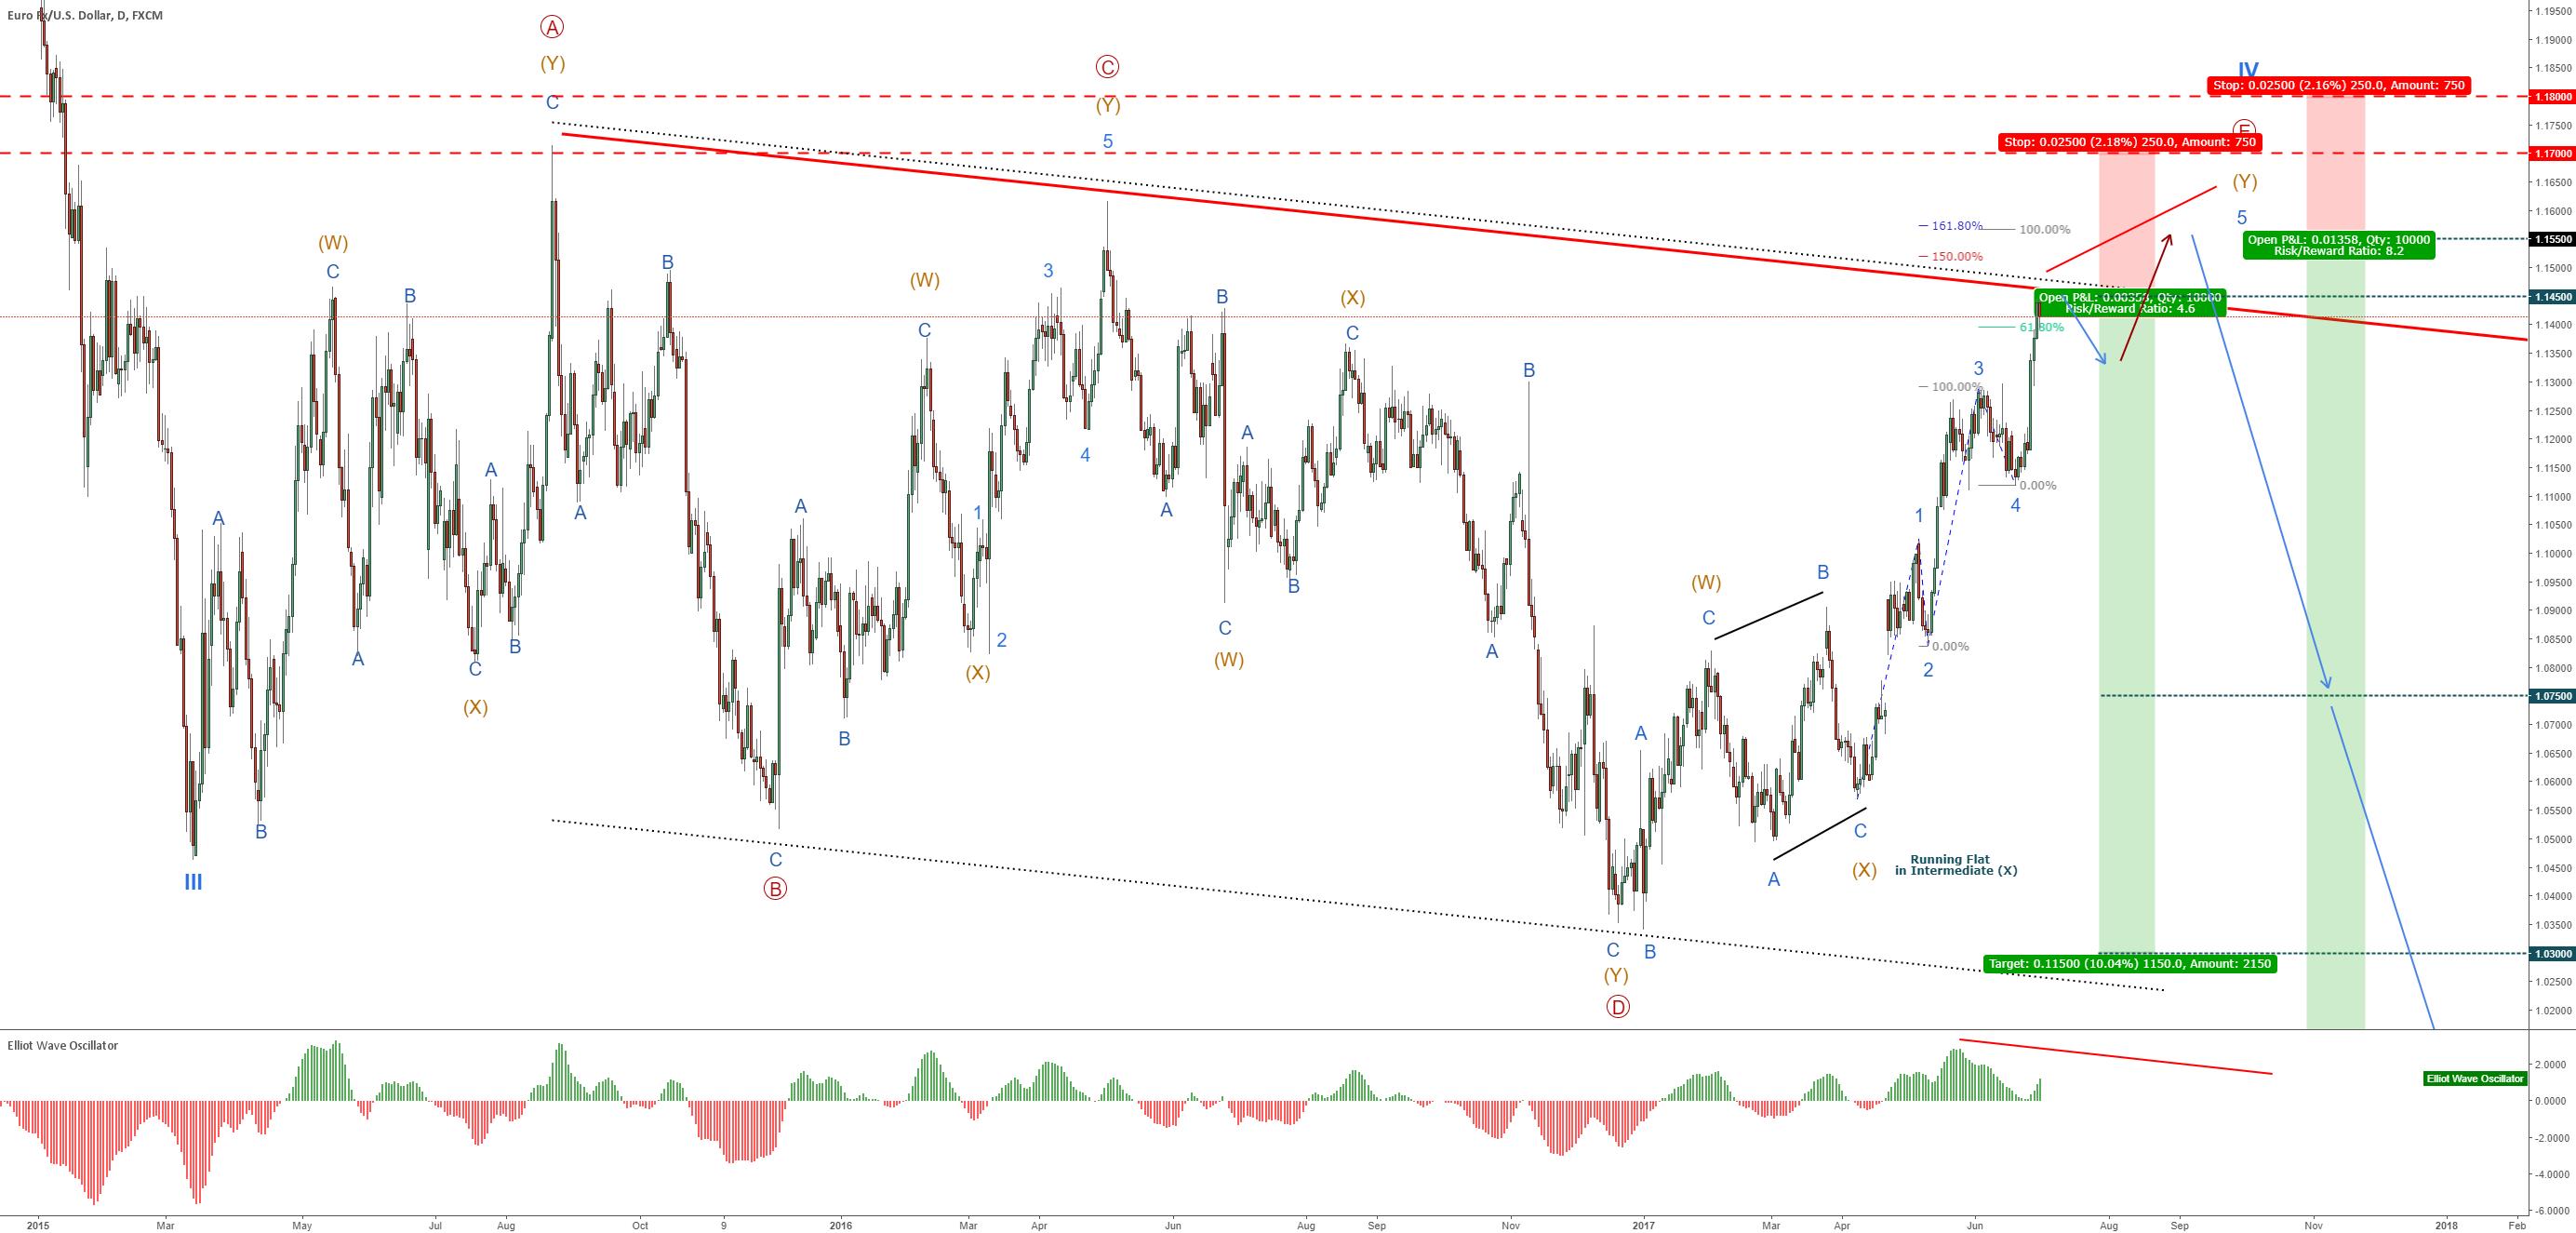 EUR/USD – Descending Bearish Channel – Elliott Wave Cycle